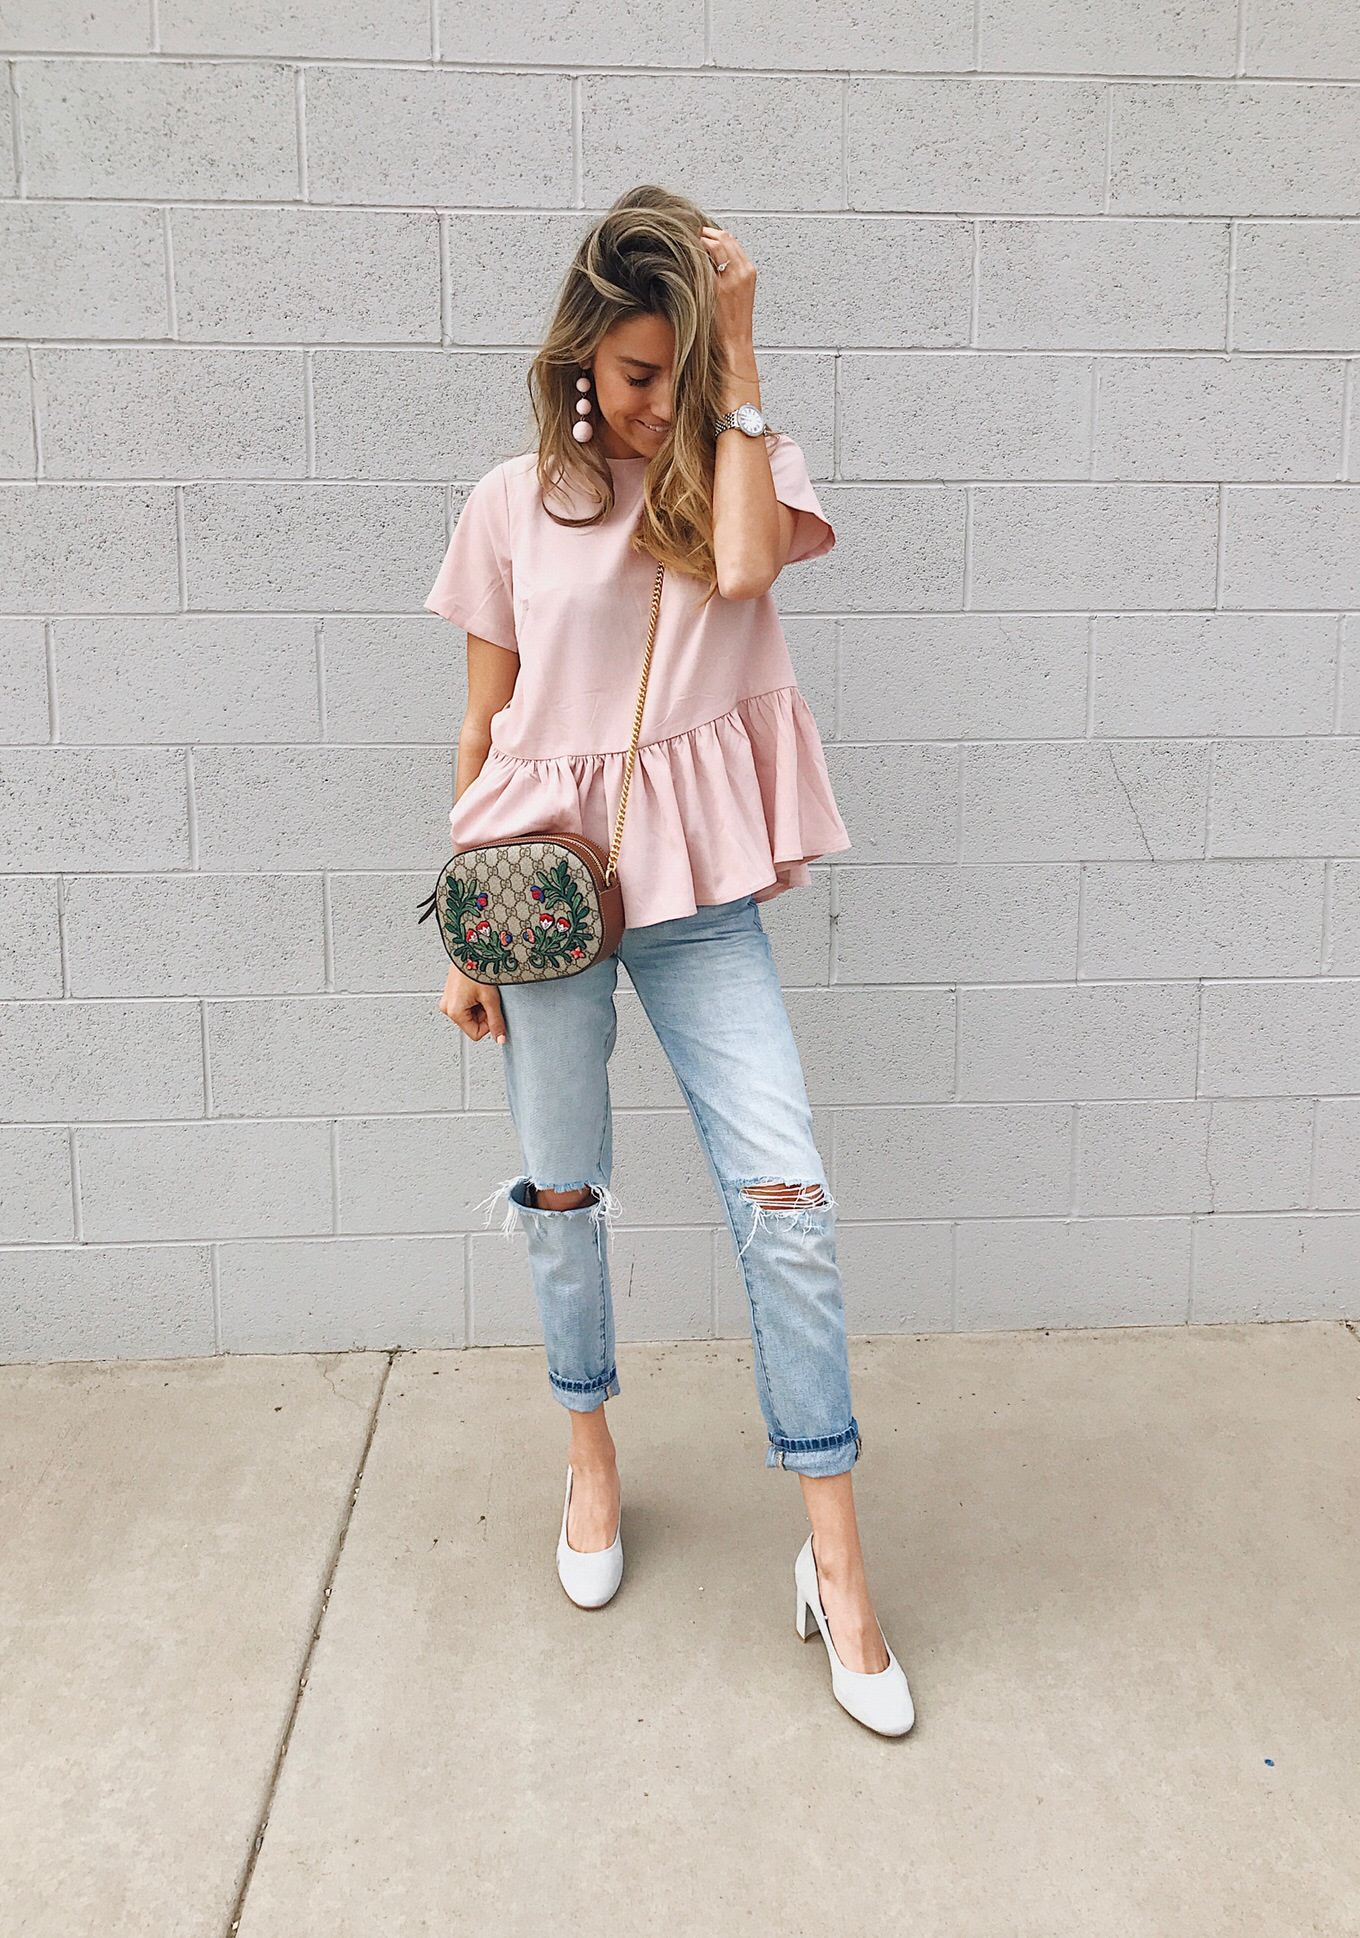 Daily Style Diary: May 19th, 2017 -   16 feminine casual style ideas